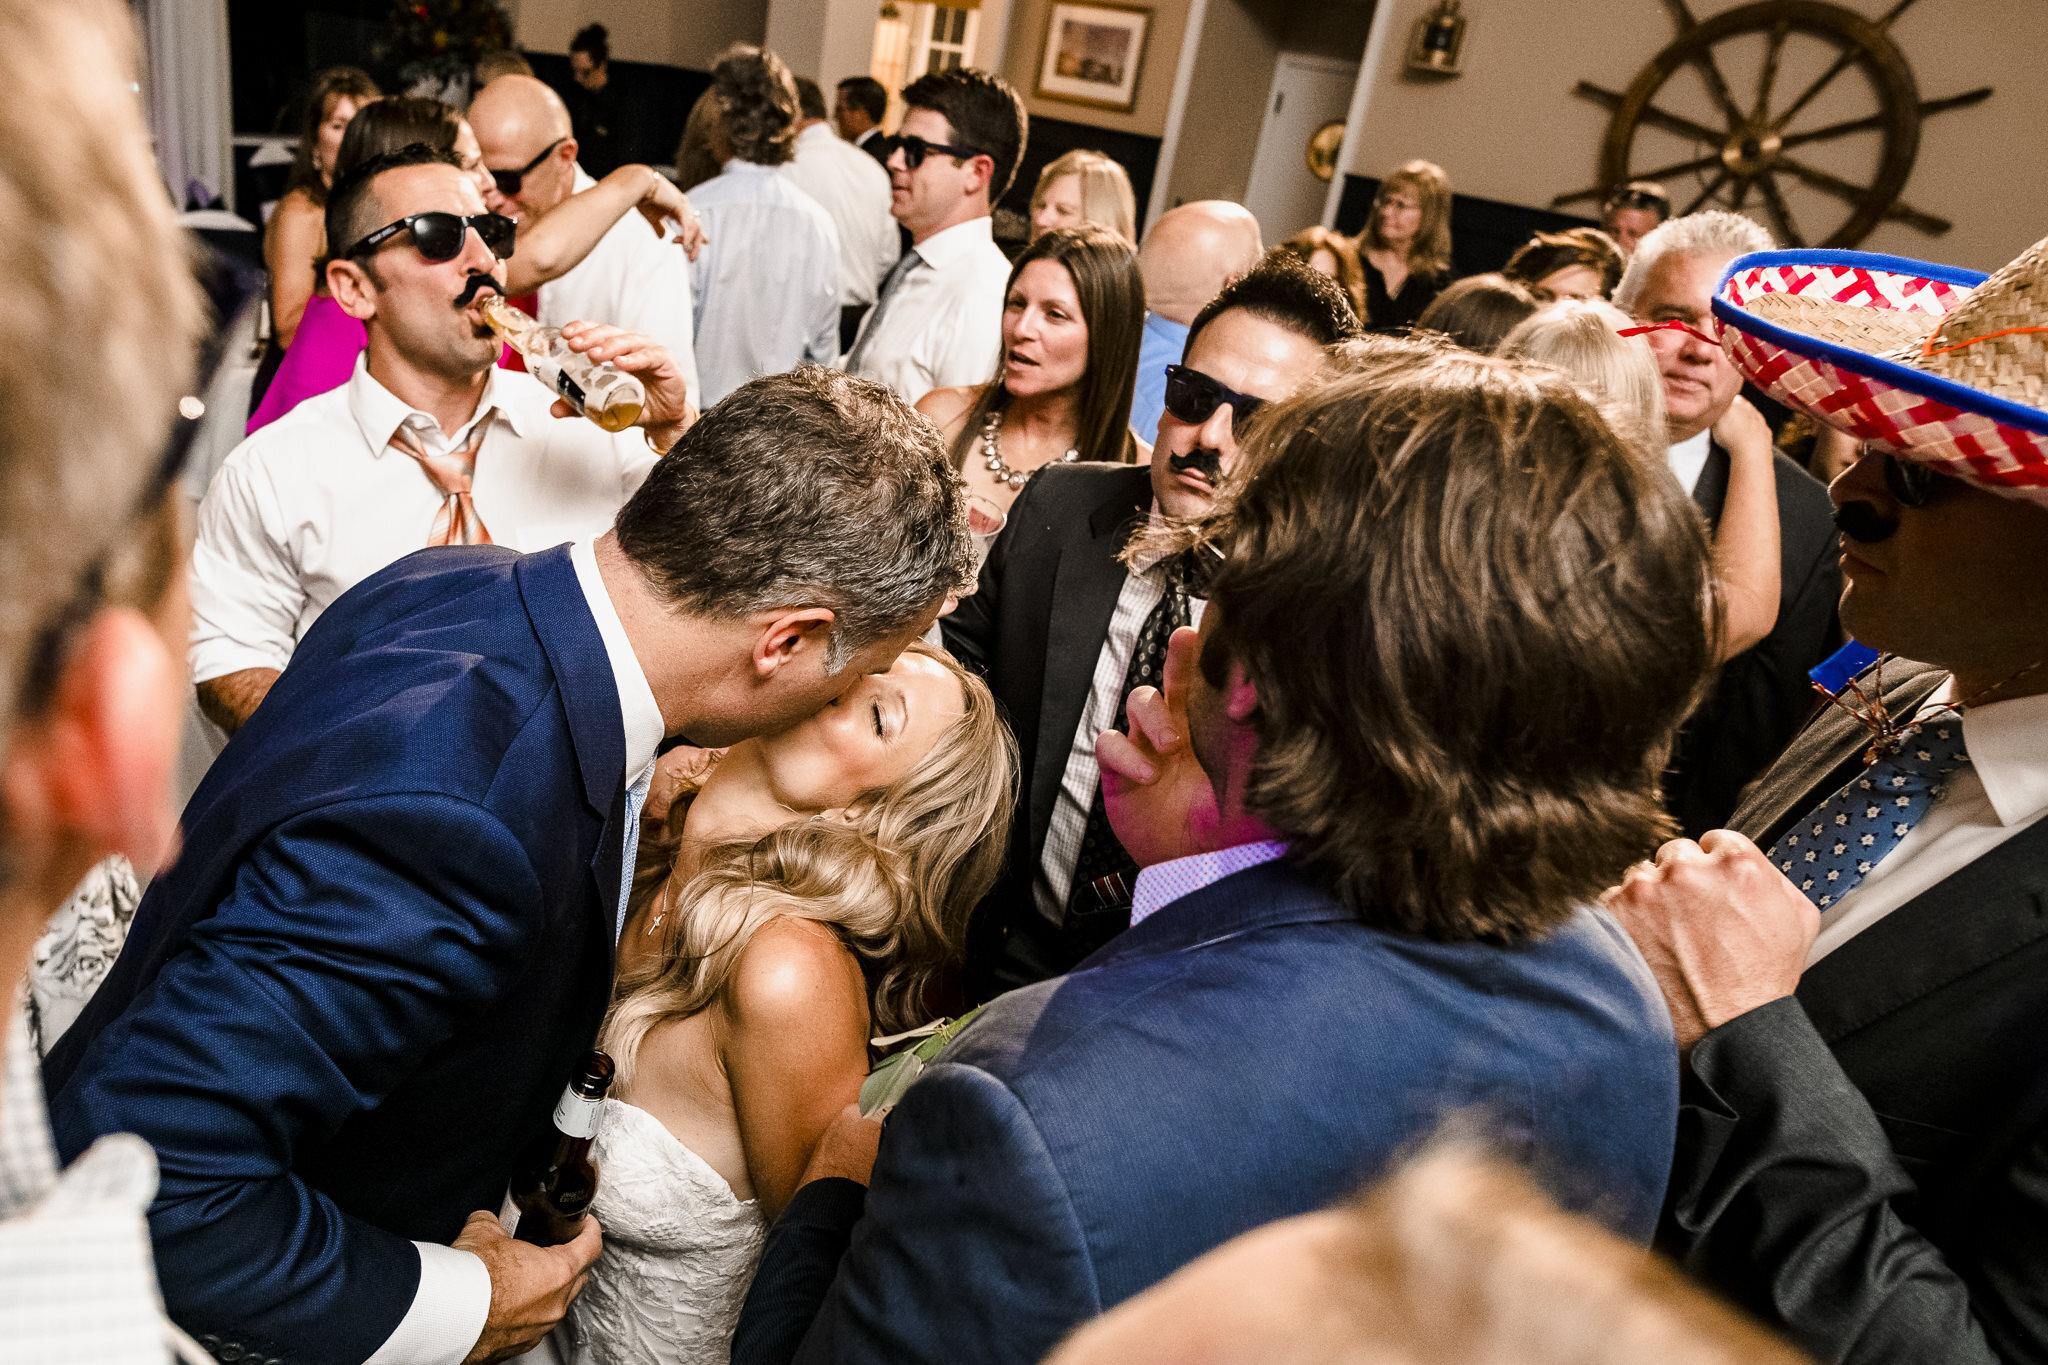 Snell-Ocean-City-Yacht-Club-New-Jersey-Wedding-Photographer-44.JPG